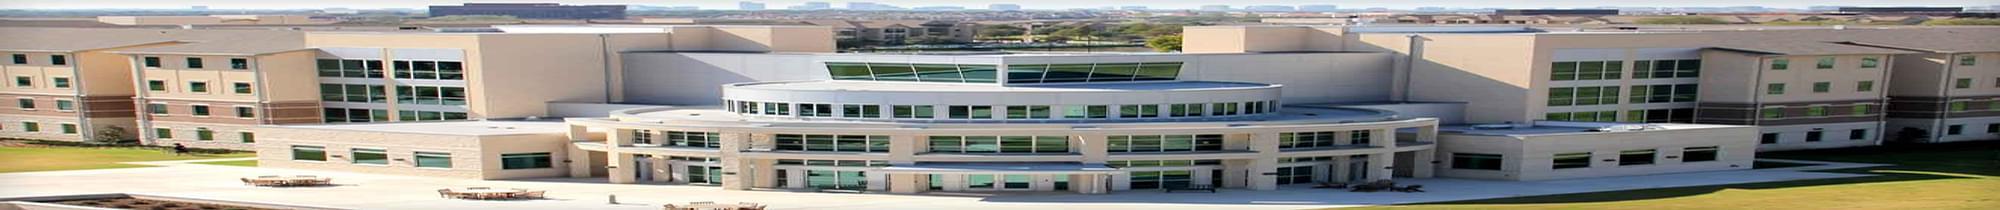 Ut Dallas Academic Calendar Fall 2022.University Of Texas Dallas Utdallas Richardson Courses Fees Ranking Admission Criteria